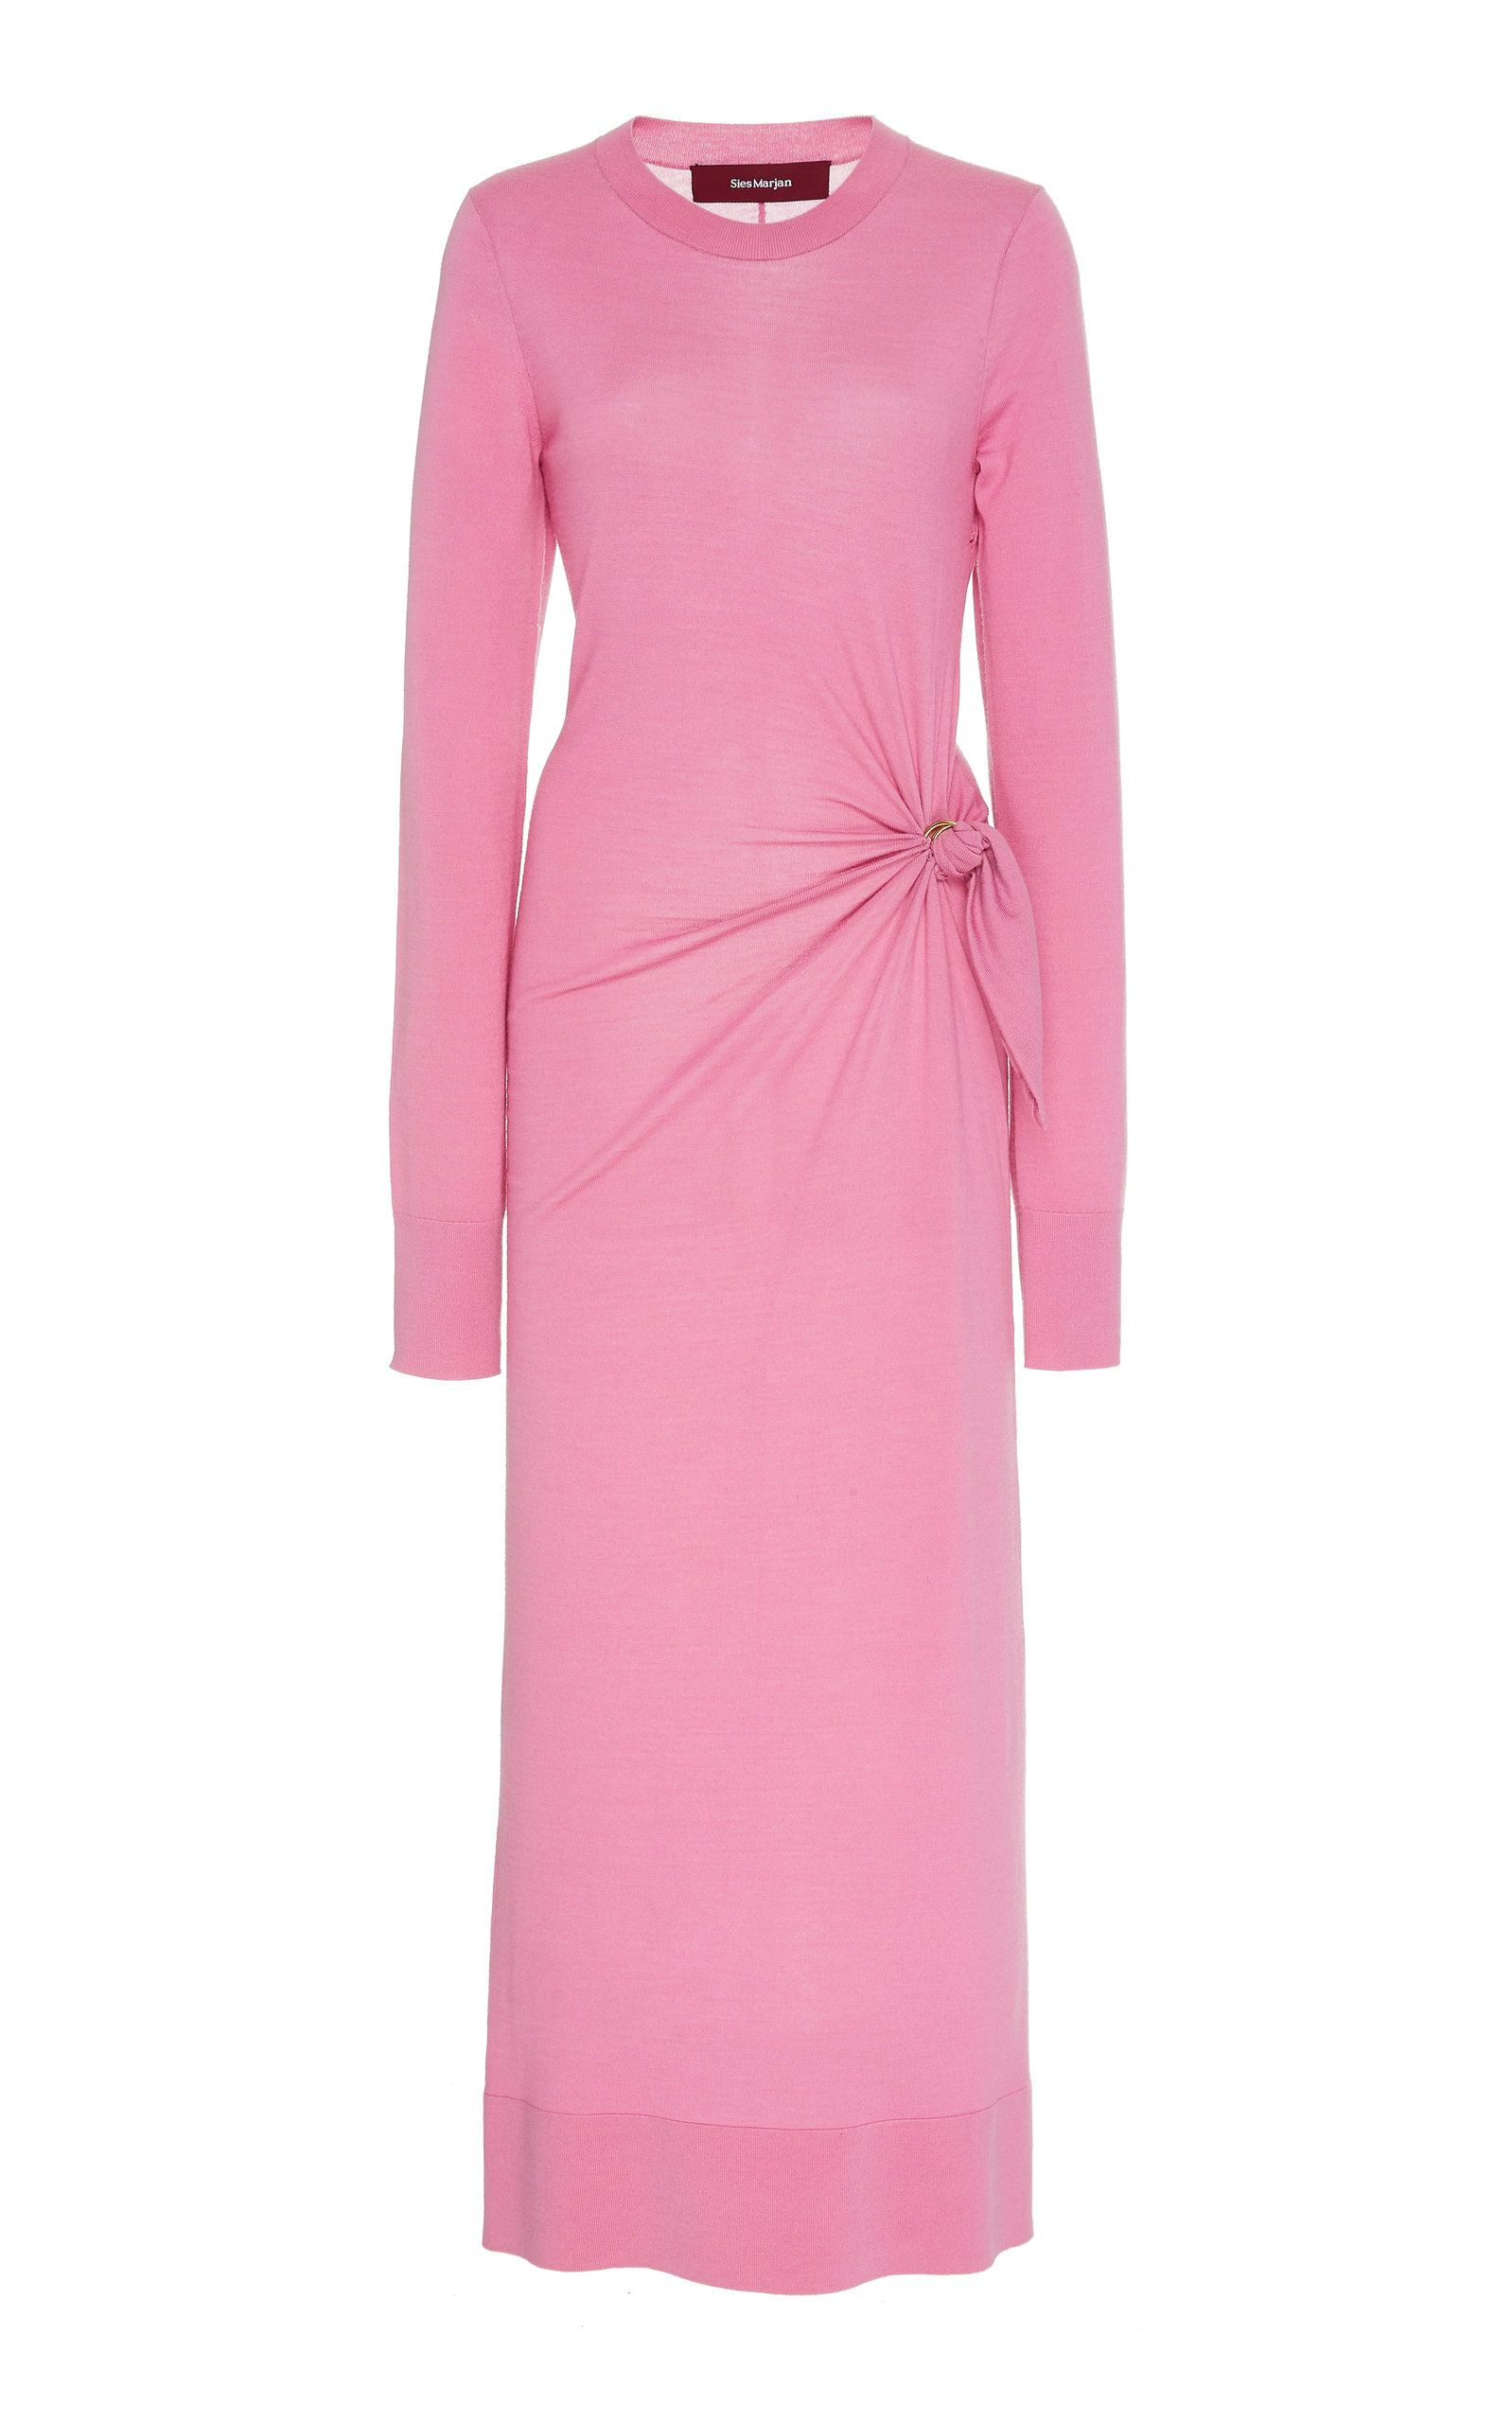 Sies Marjan Selma pink merino wool dress ($795) | Midi